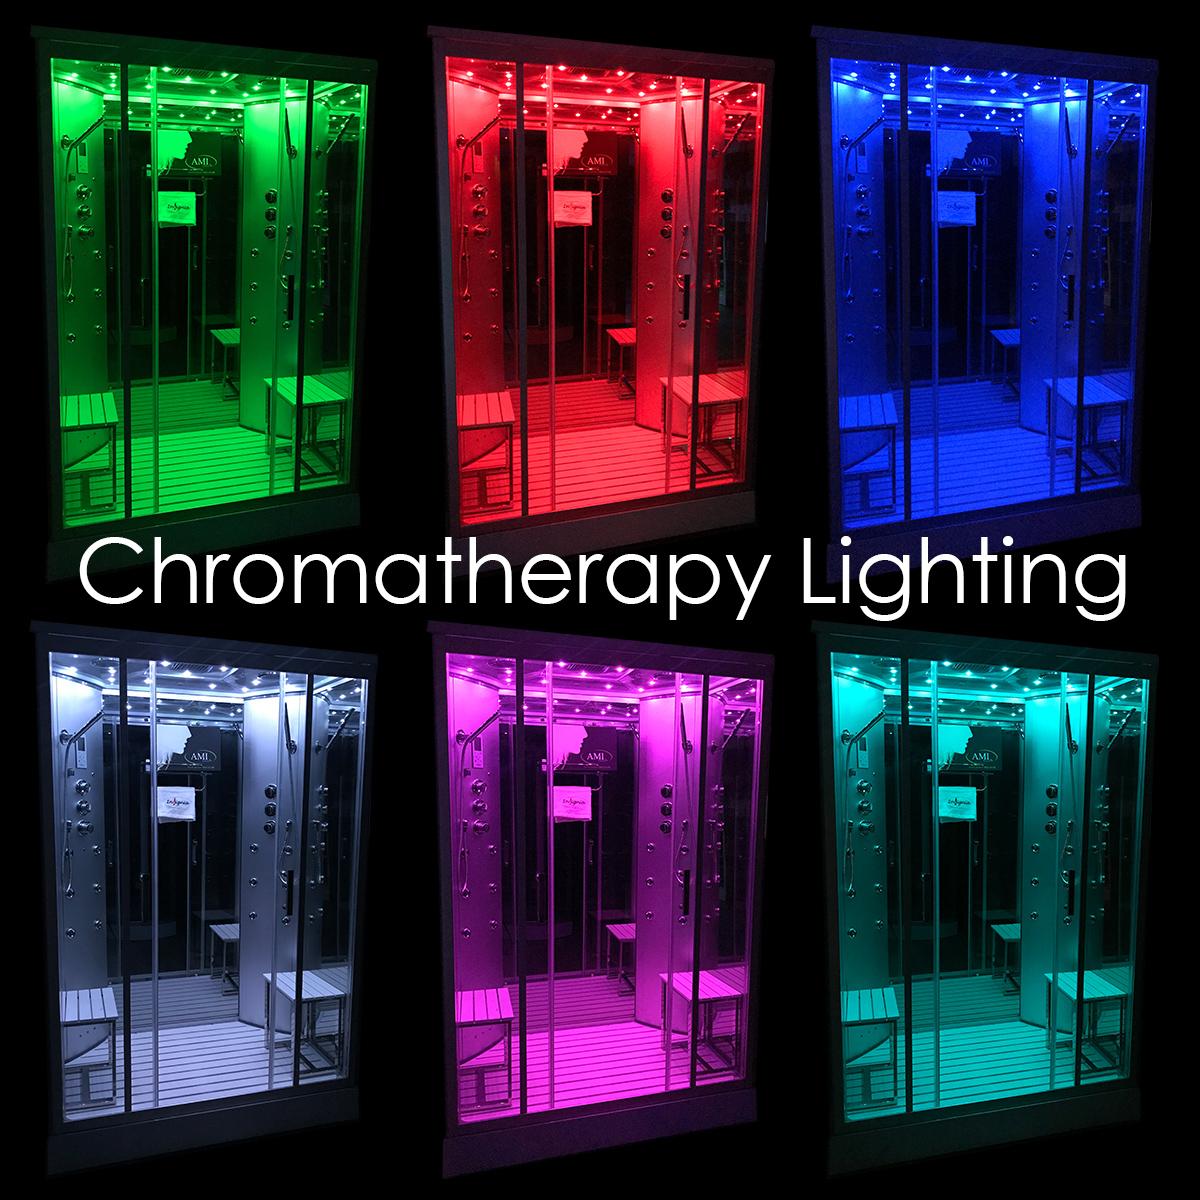 Insignia Chromatherapy Lighting